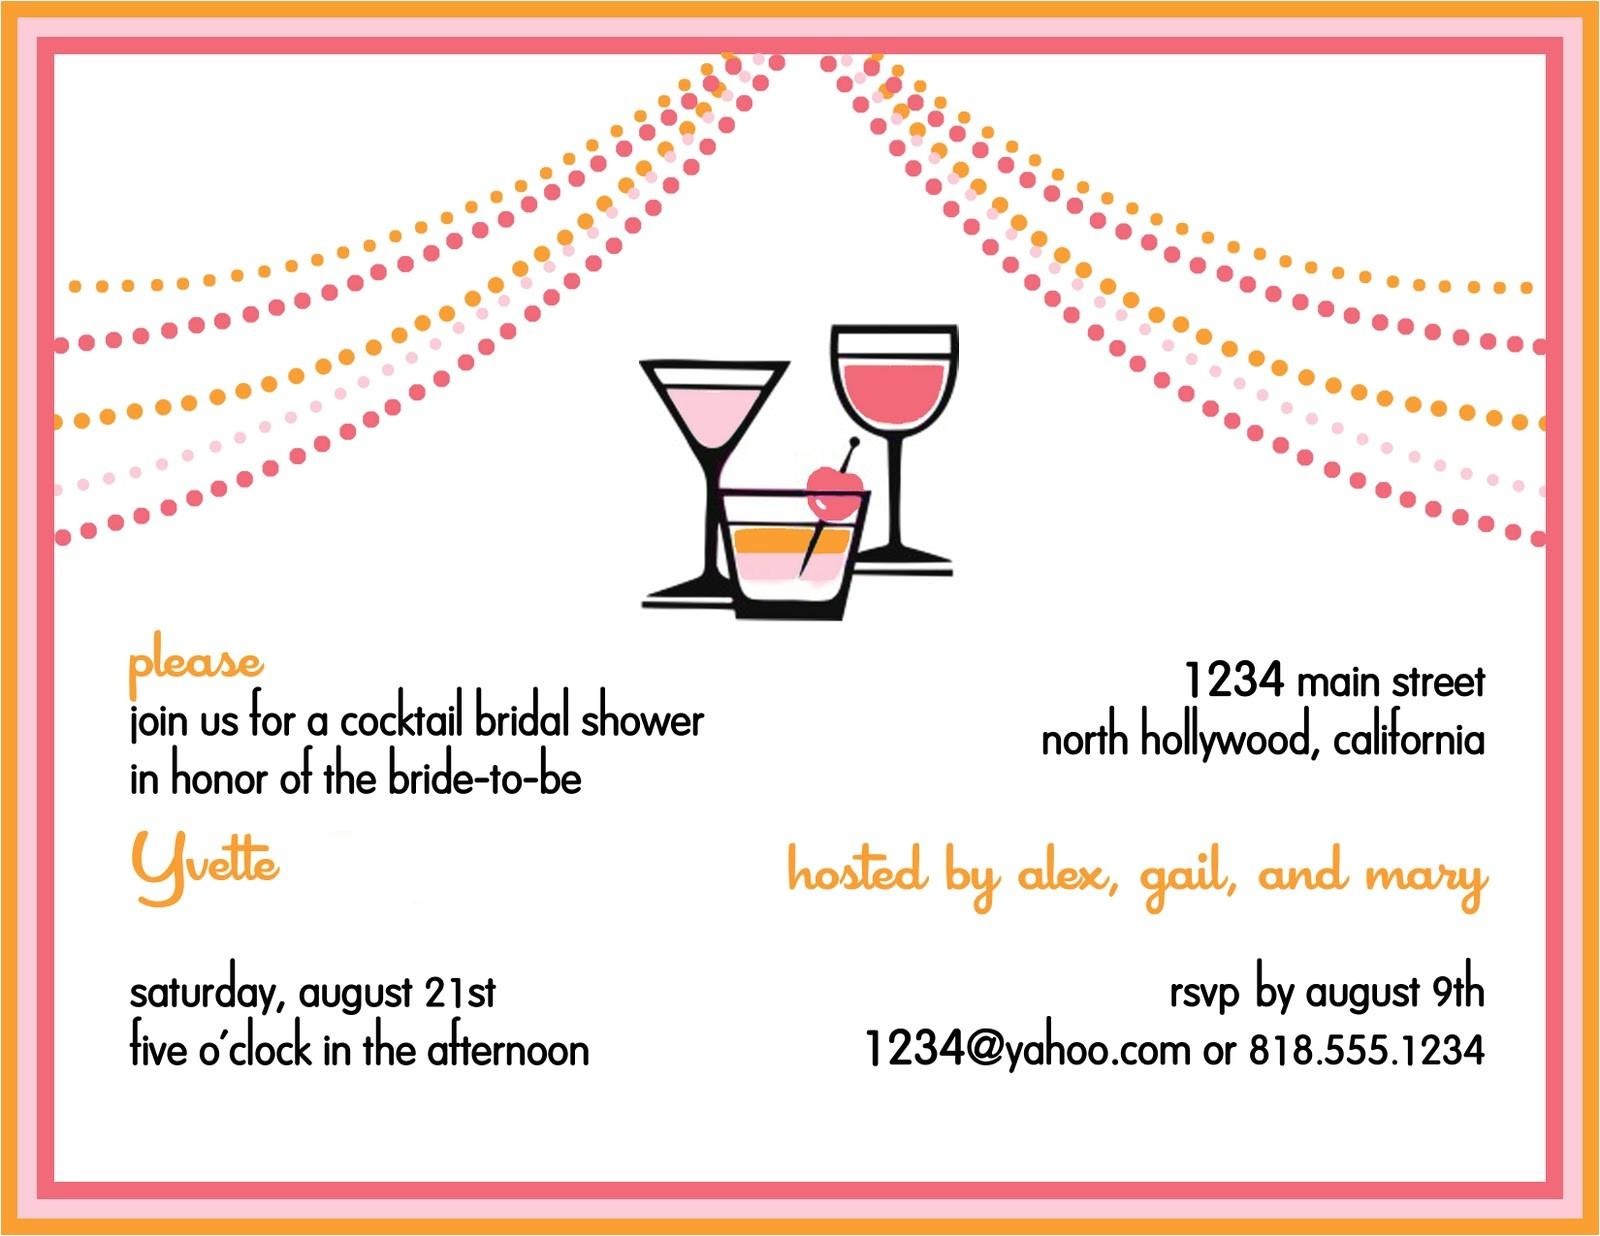 Cocktail Bridal Shower Invitation Wording Wedding Invitations and Baby Shower Invitations Share